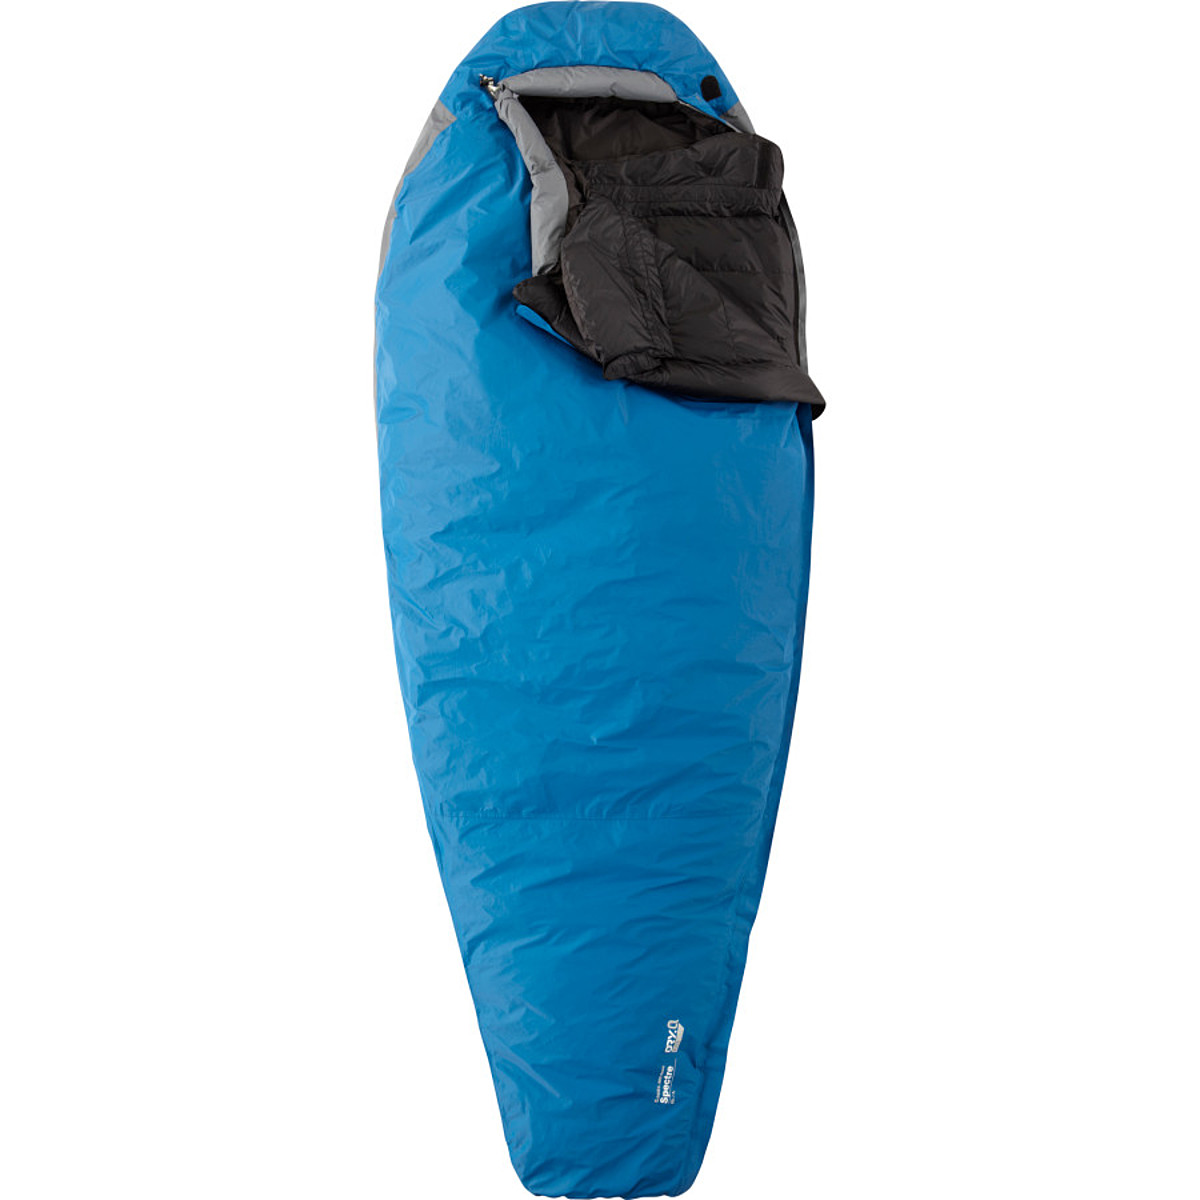 photo: Mountain Hardwear Spectre SL 20° 3-season down sleeping bag